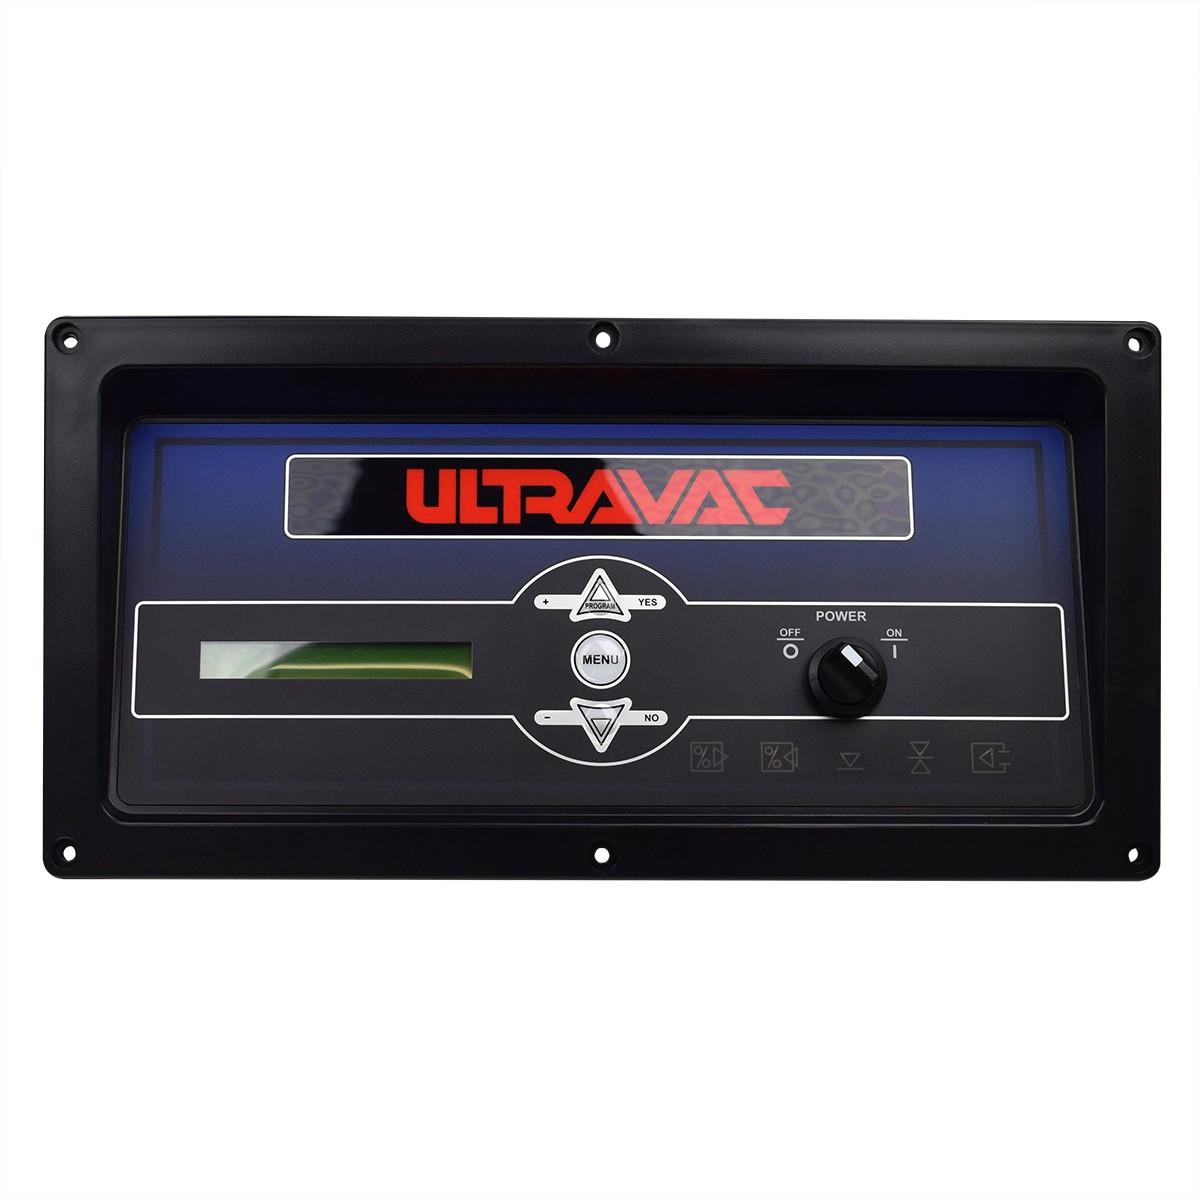 Digital Control Panel : Base ultravac digital control panel version xx